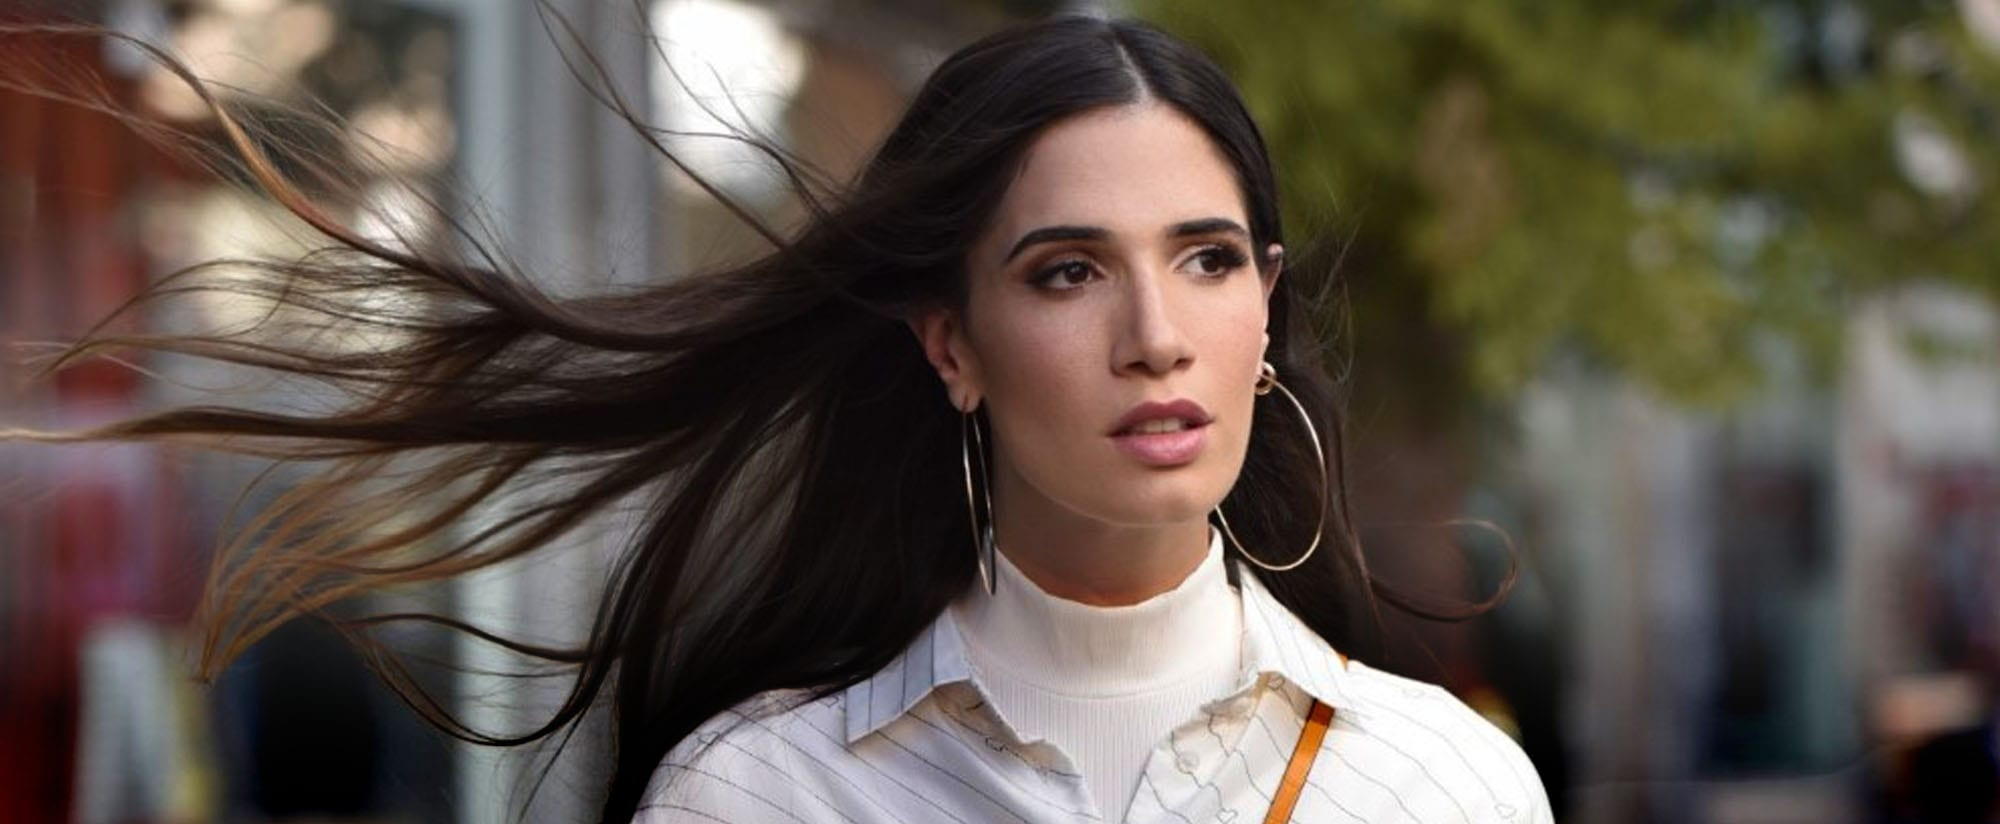 Fashion Israel, חן אמסלם לקמפיין הסתיו של H&M צילום מאיר כהן (2)